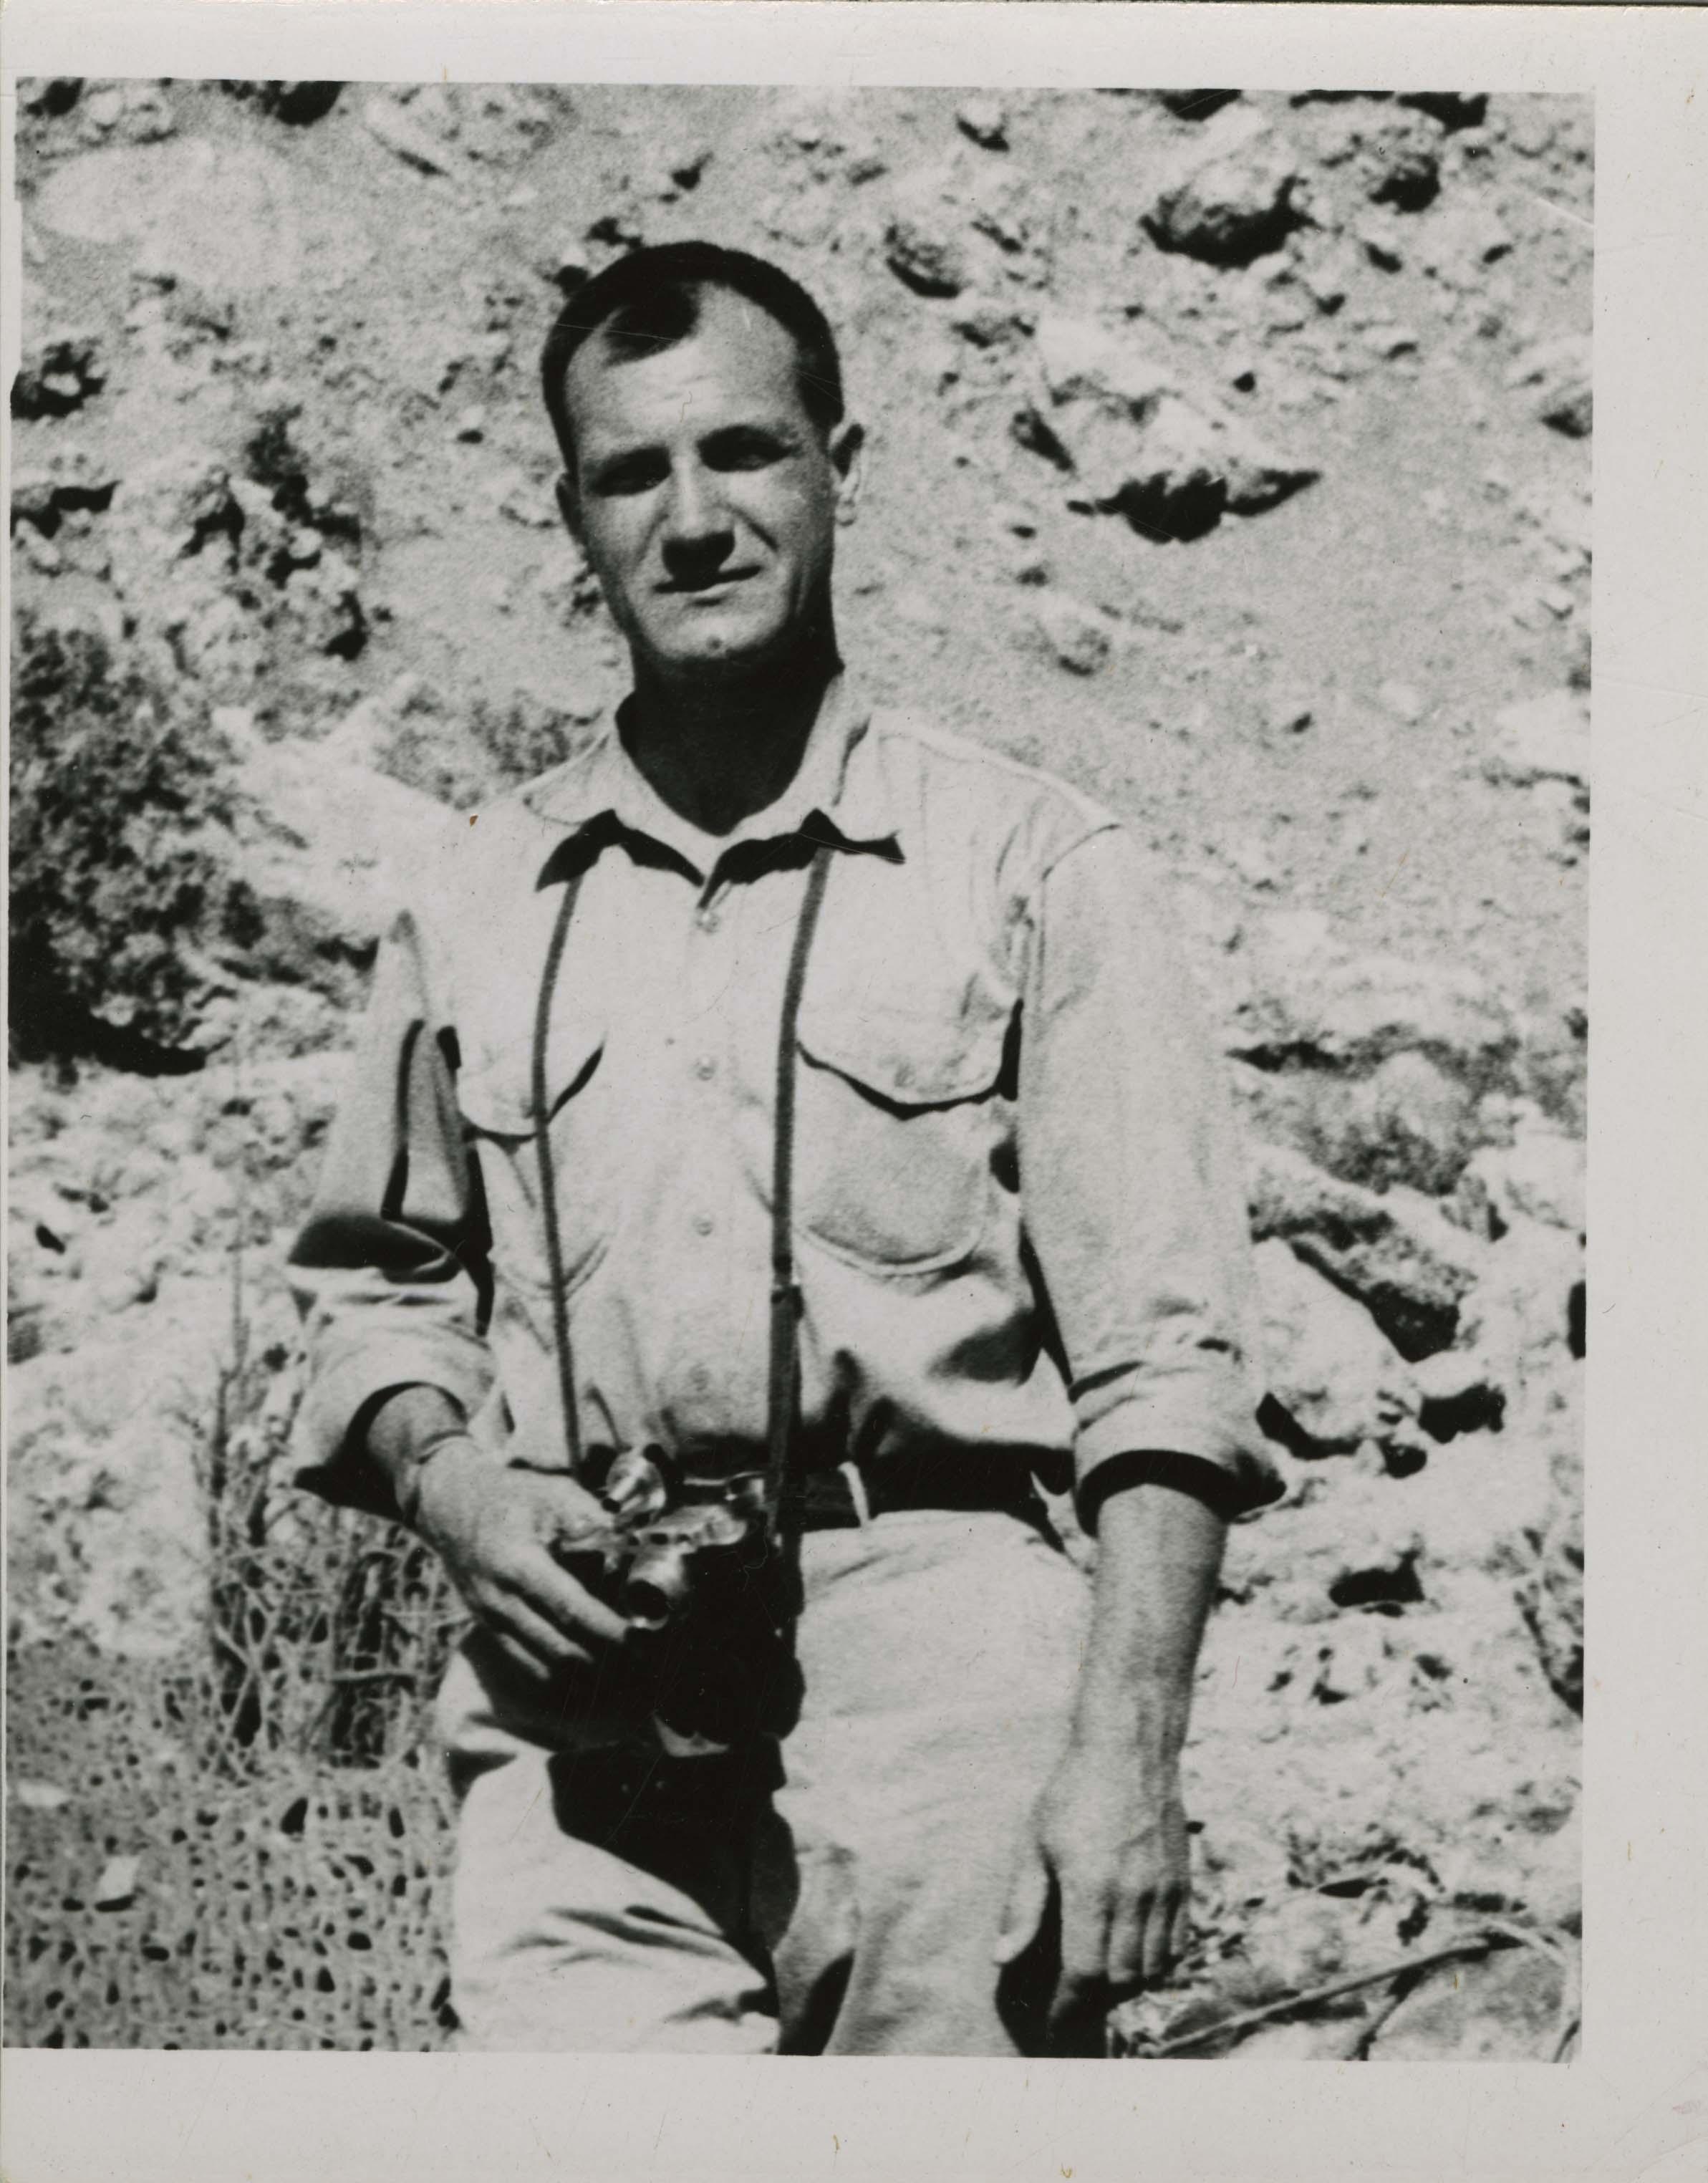 Photo of Ralph Solecki